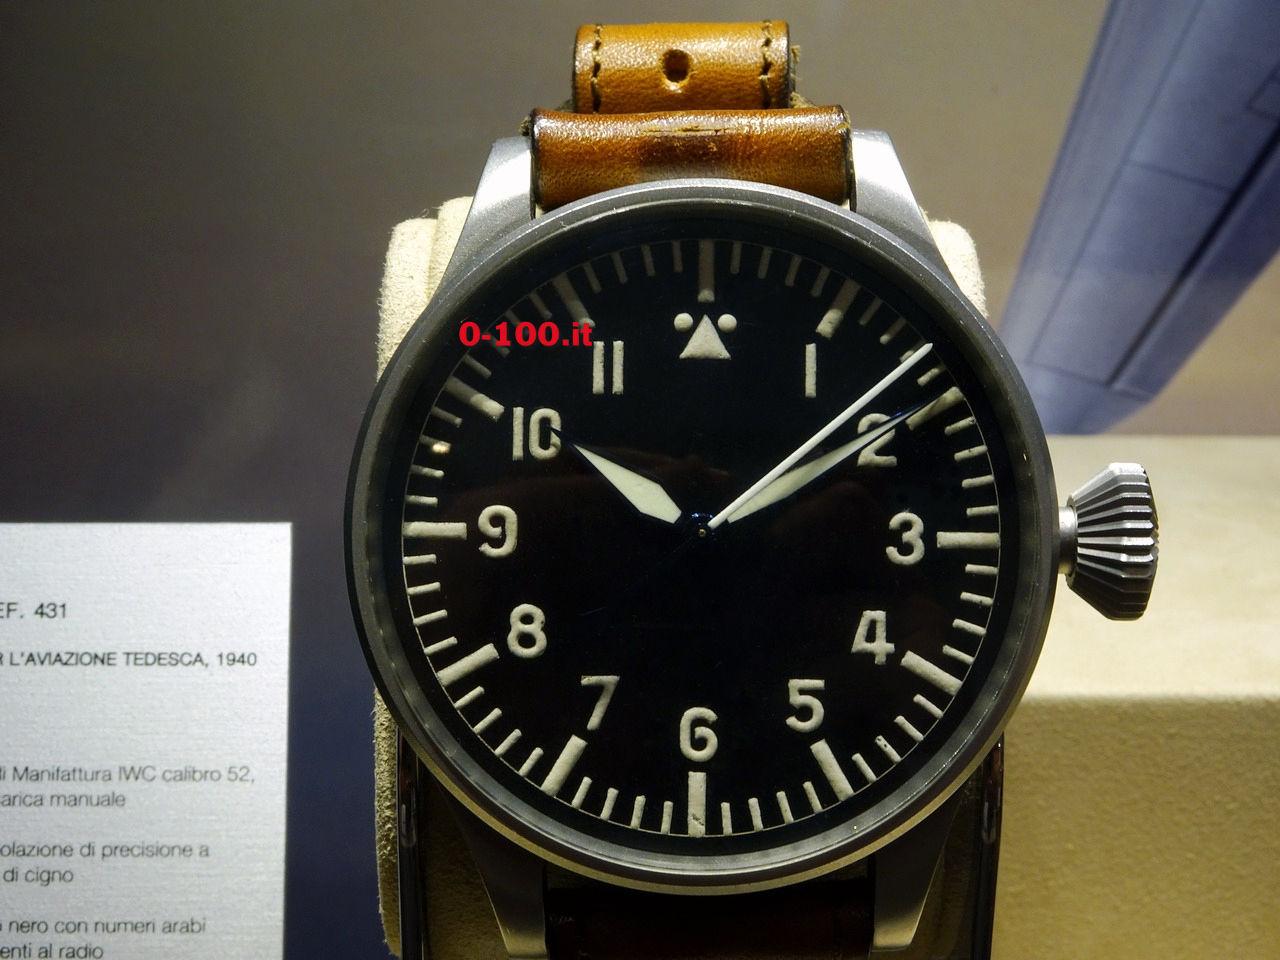 IWC_pilot_heritage-0-100_9